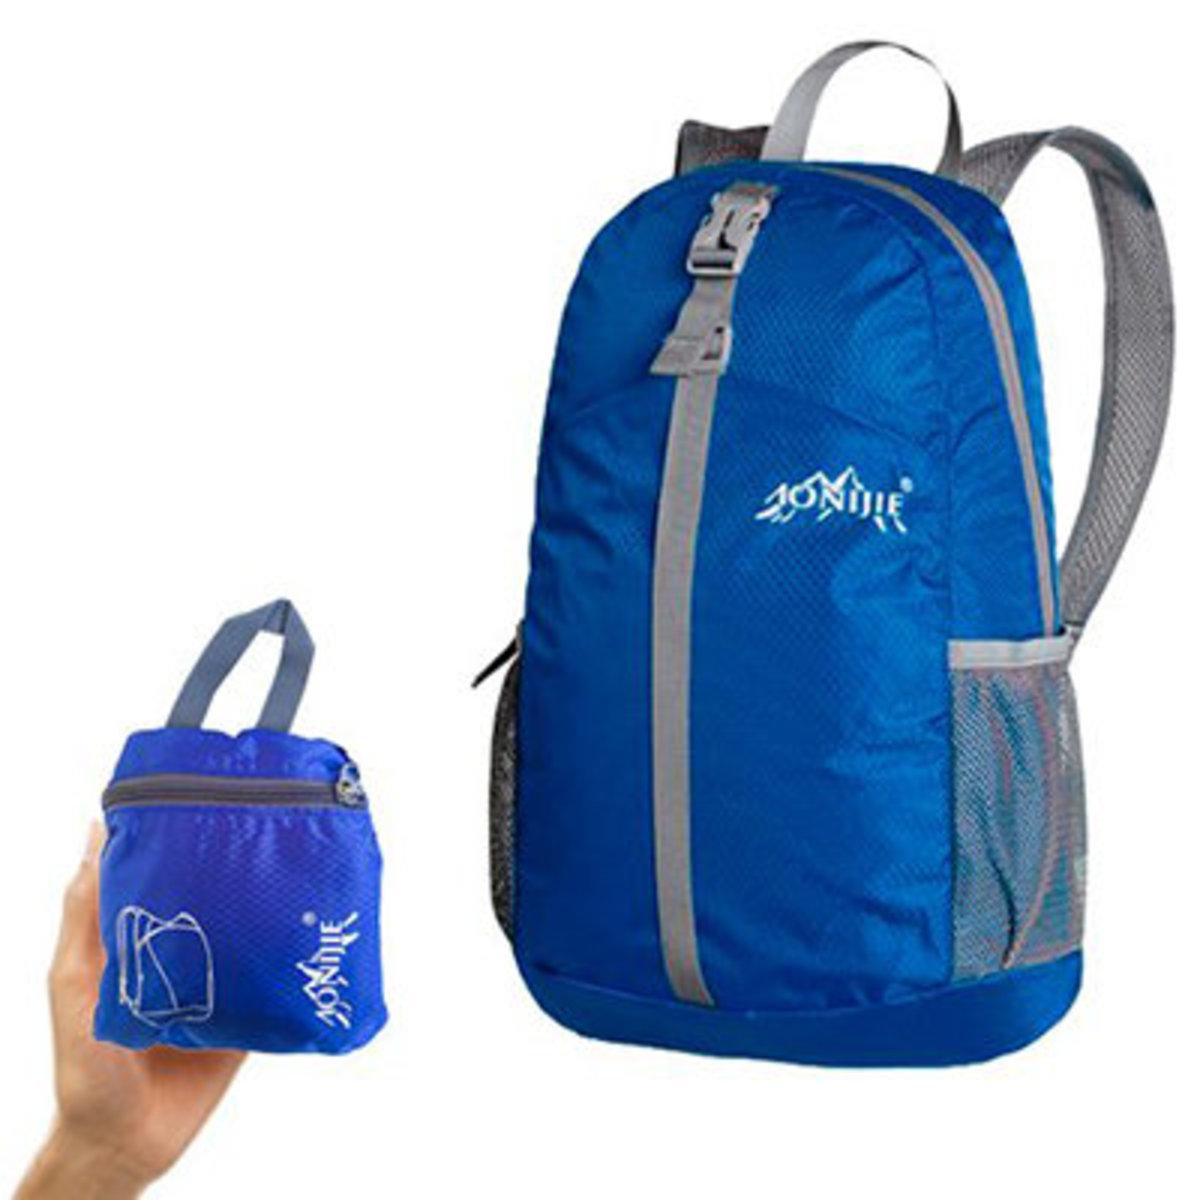 Lightweight, foldable backpack